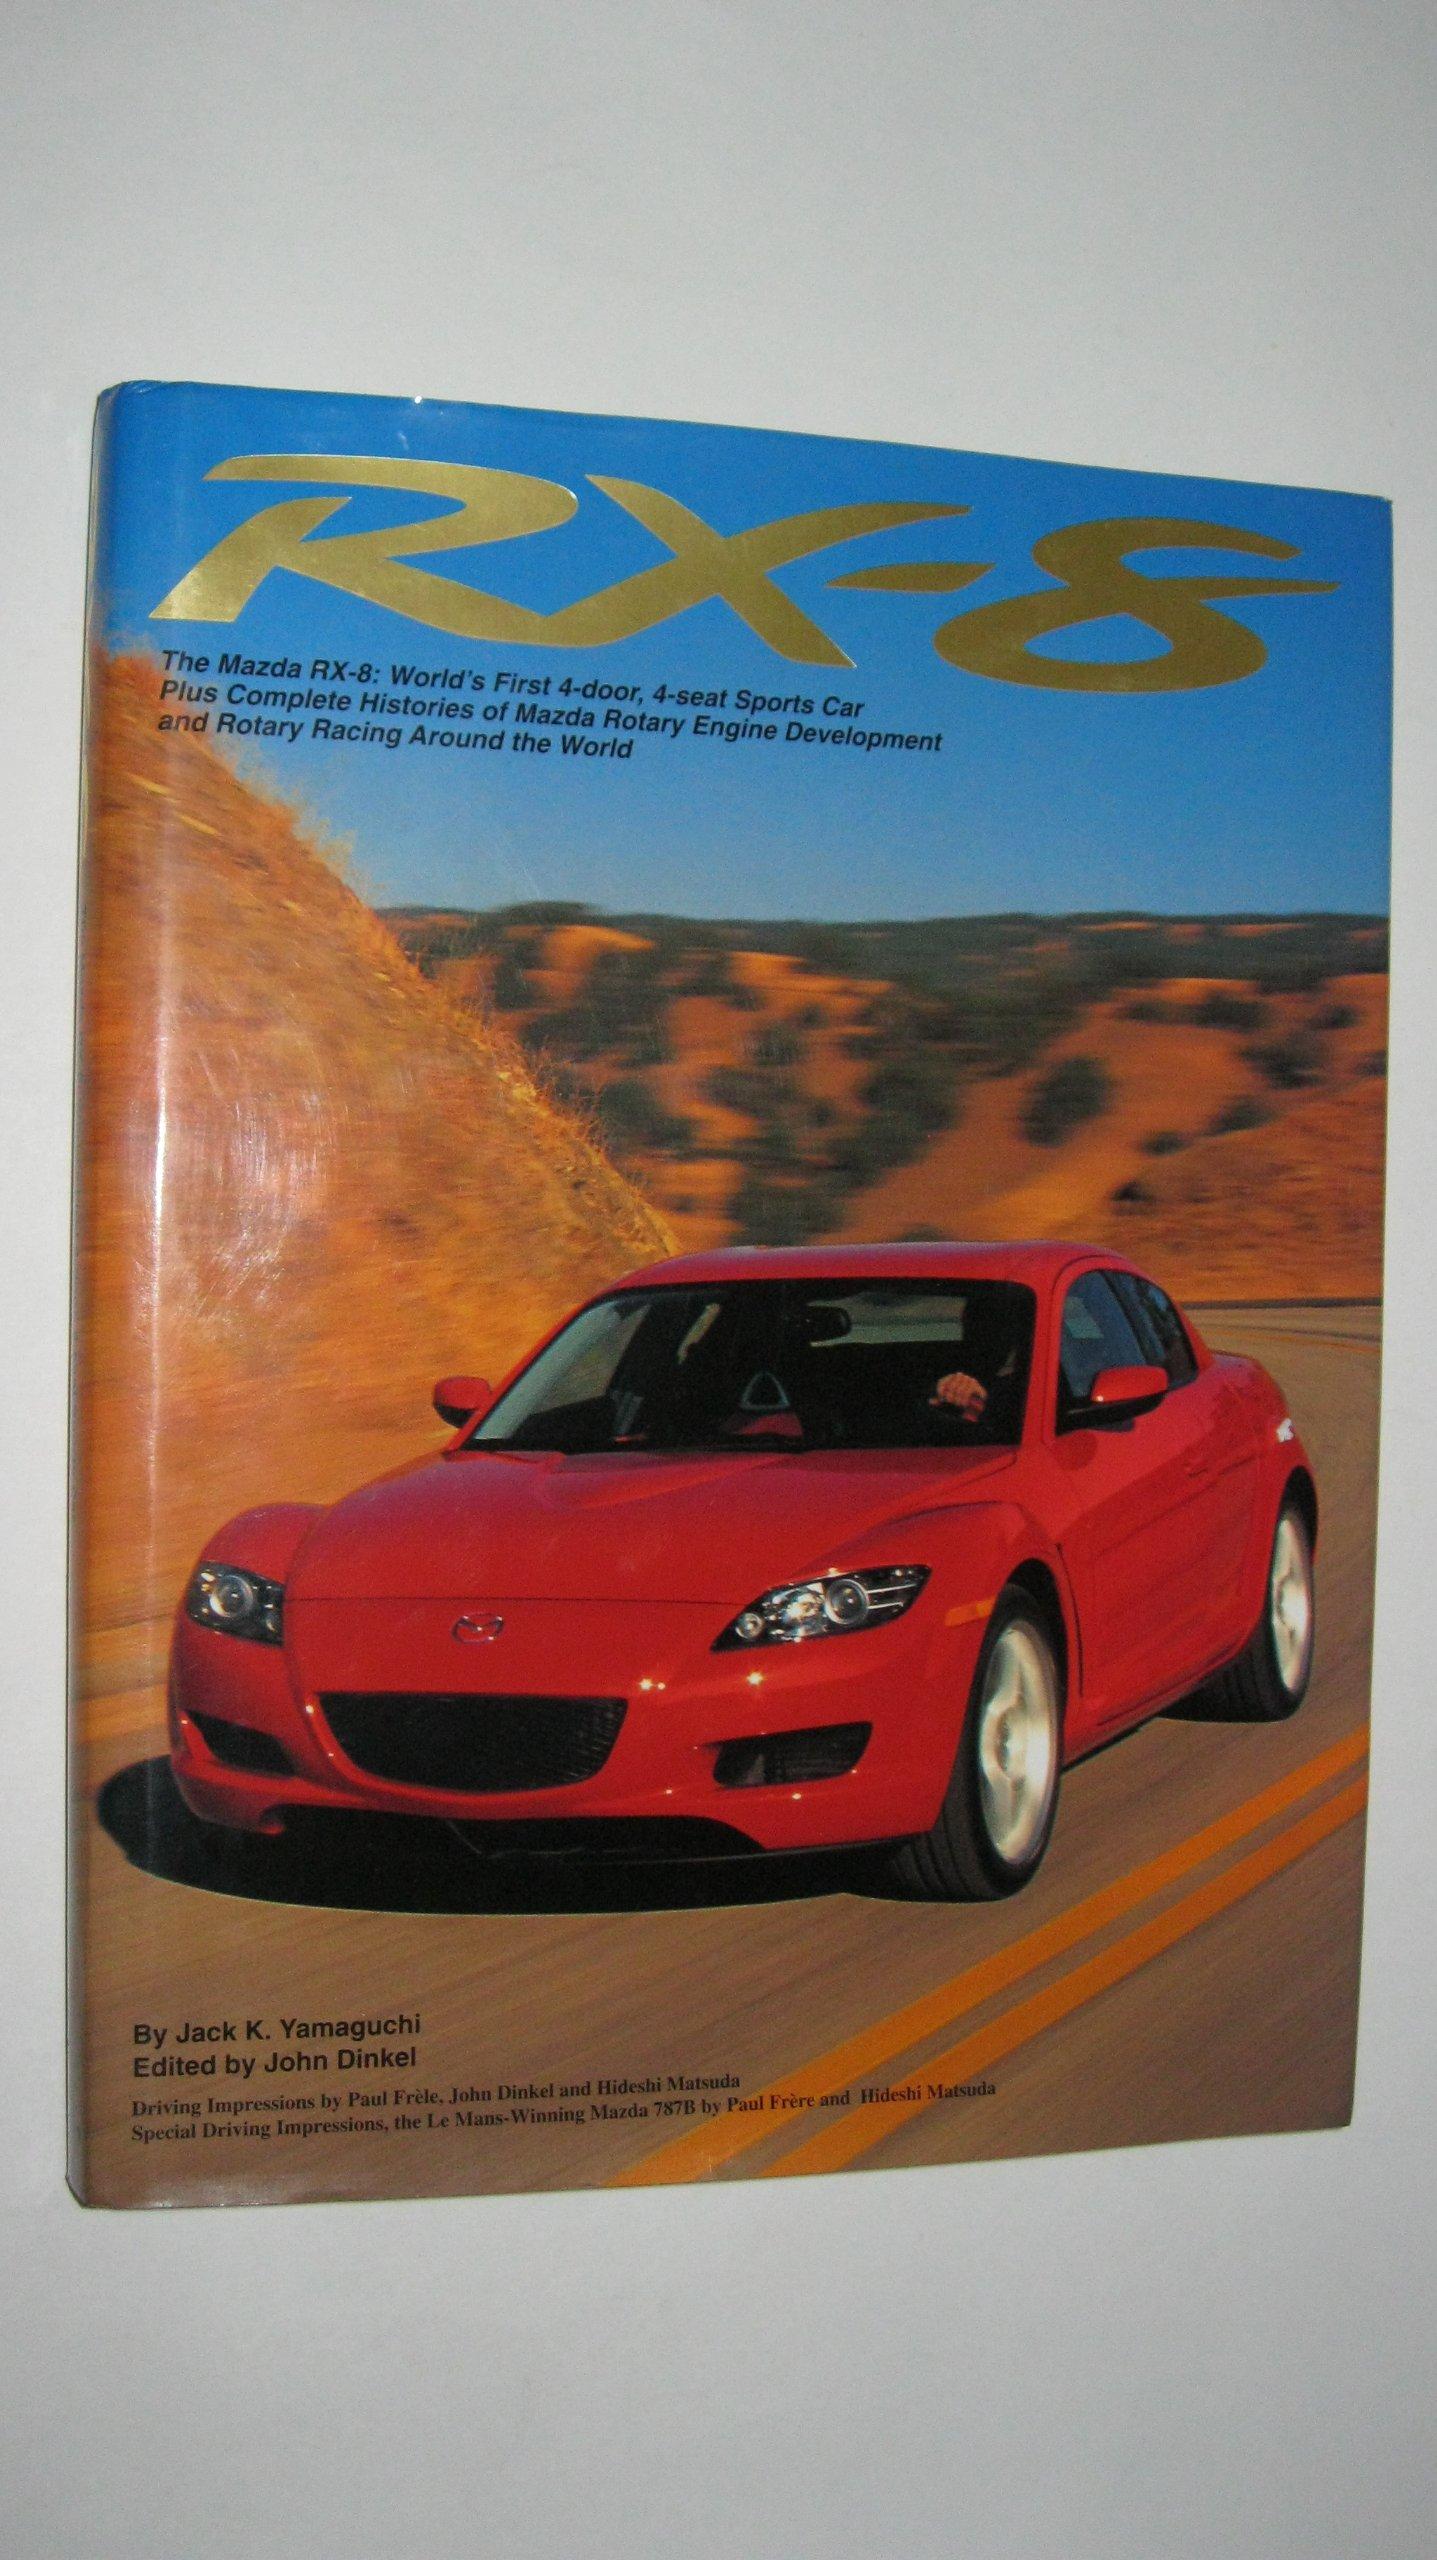 RX-8 The Mazda RX-8 Worldu0027s First 4-door 4-seat Sports Car Plus Complete Histories of Mazda Rotar Jack K. Yamaguchi 9784947659026 Amazon.com Books & RX-8: The Mazda RX-8: Worldu0027s First 4-door 4-seat Sports Car Plus ...